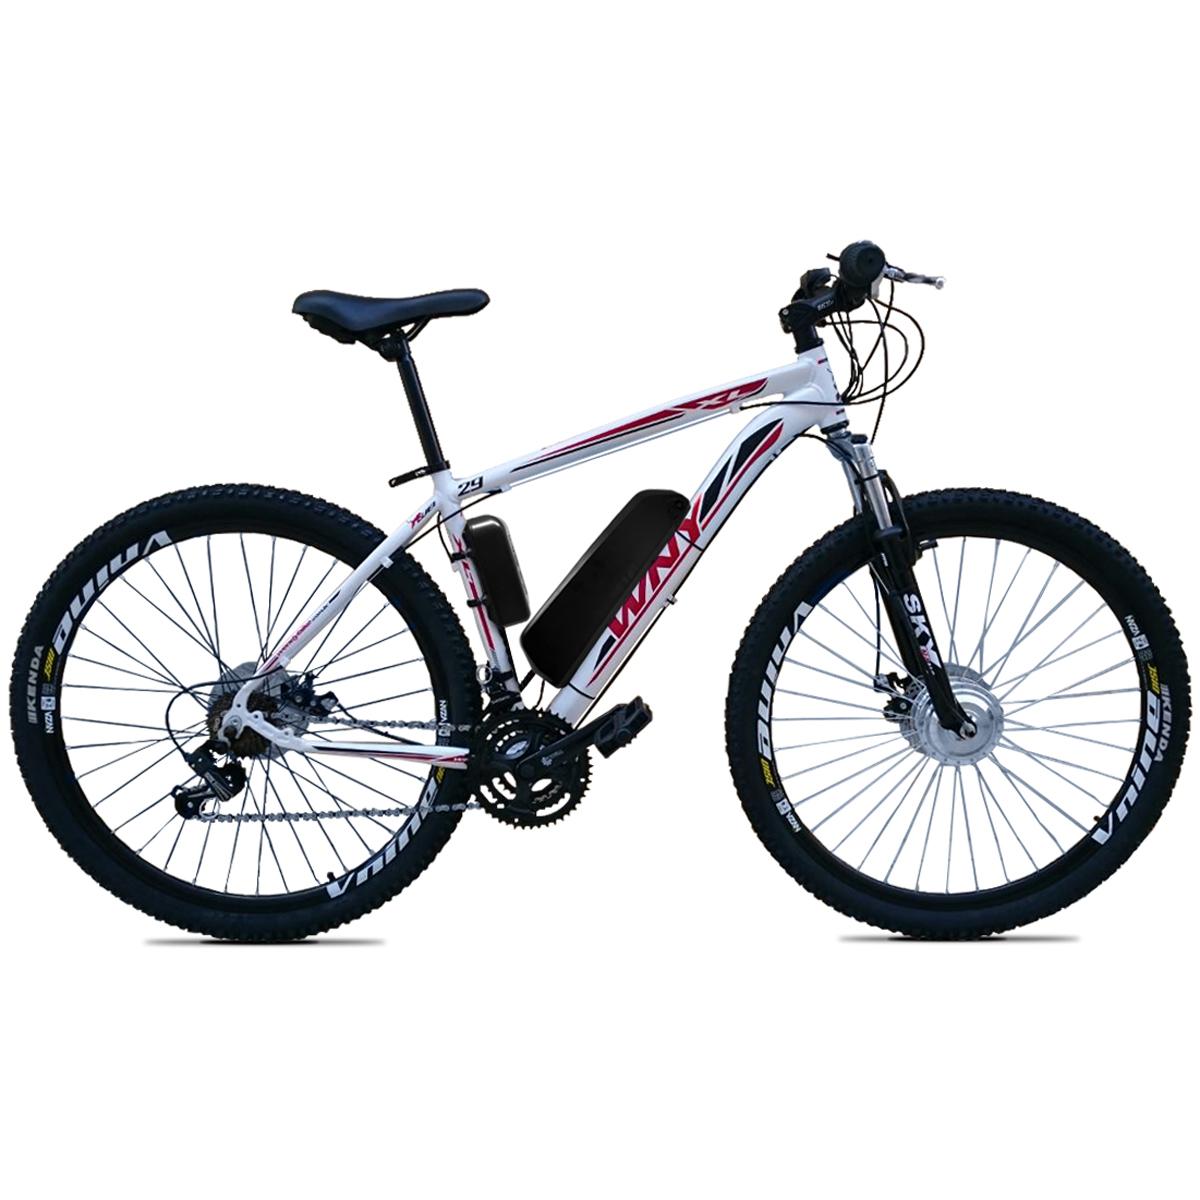 Bicicleta Elétrica Aro 29 Bateria de Lítio TecUltra 500W - Freio Hidráulico